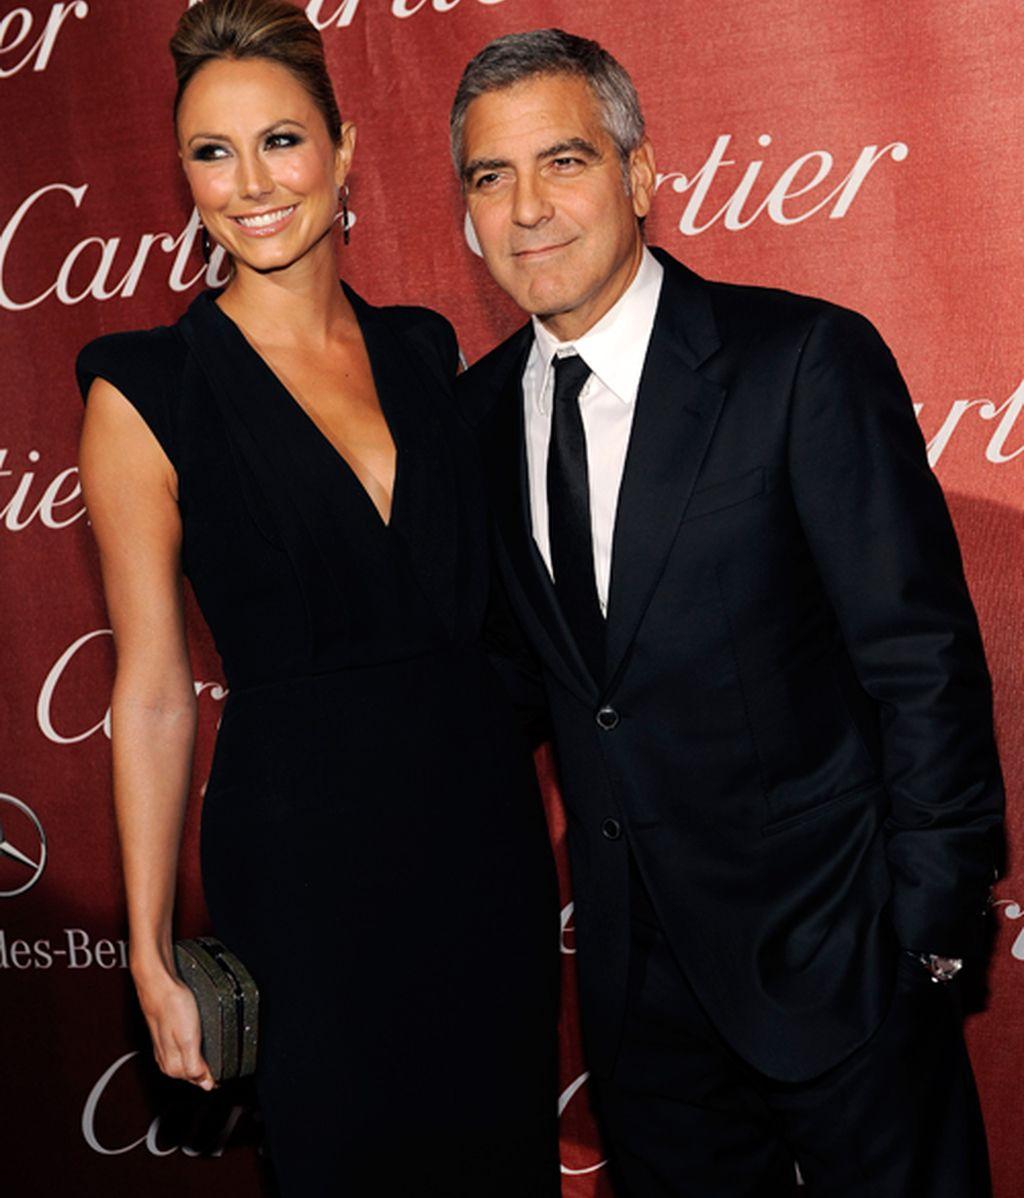 El bastón de Brad Pitt le roba el protagonismo a la novia de Clooney